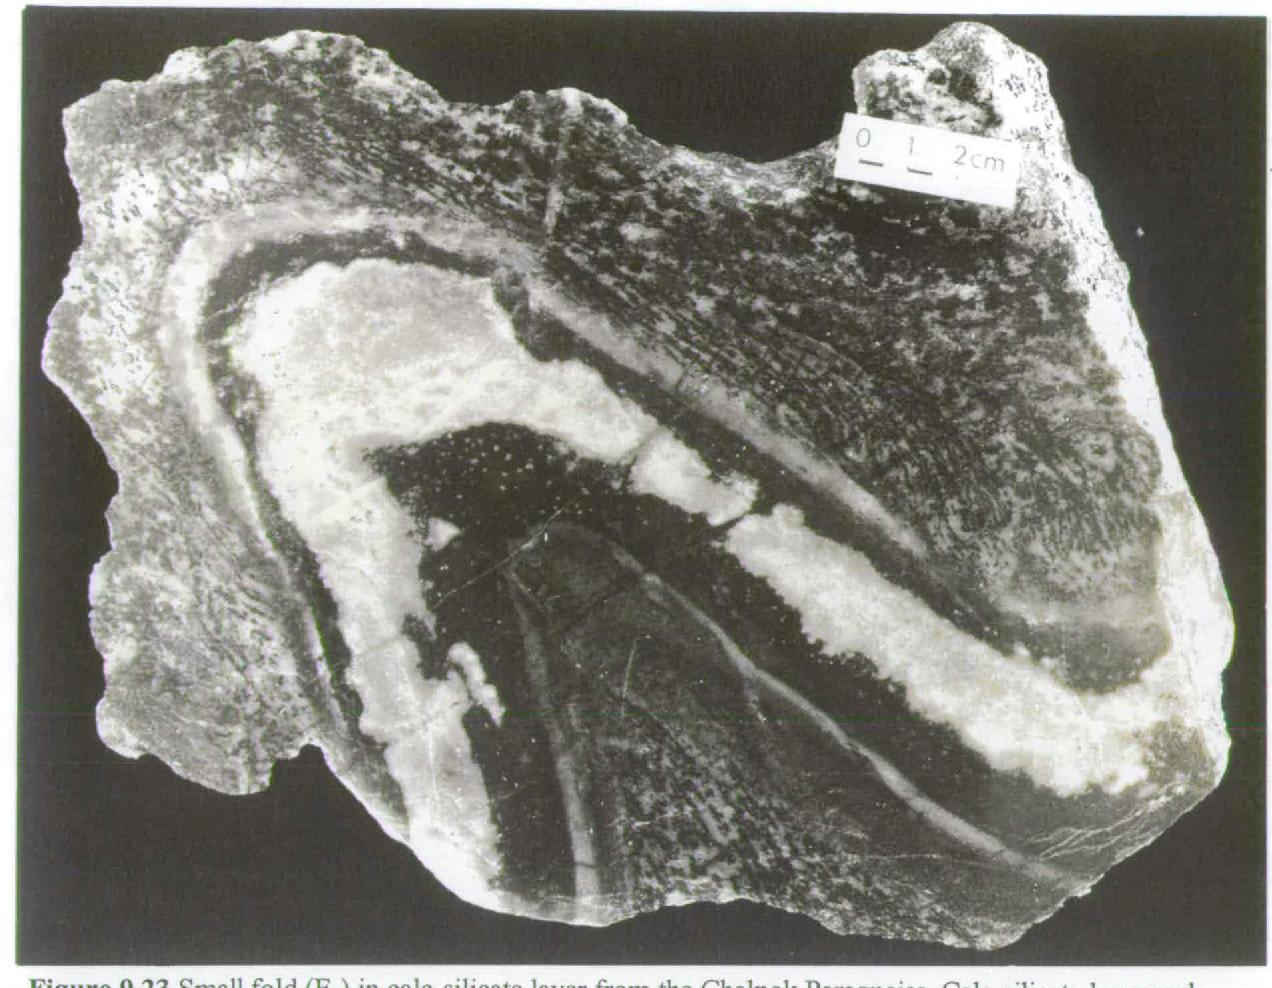 figure 9.23